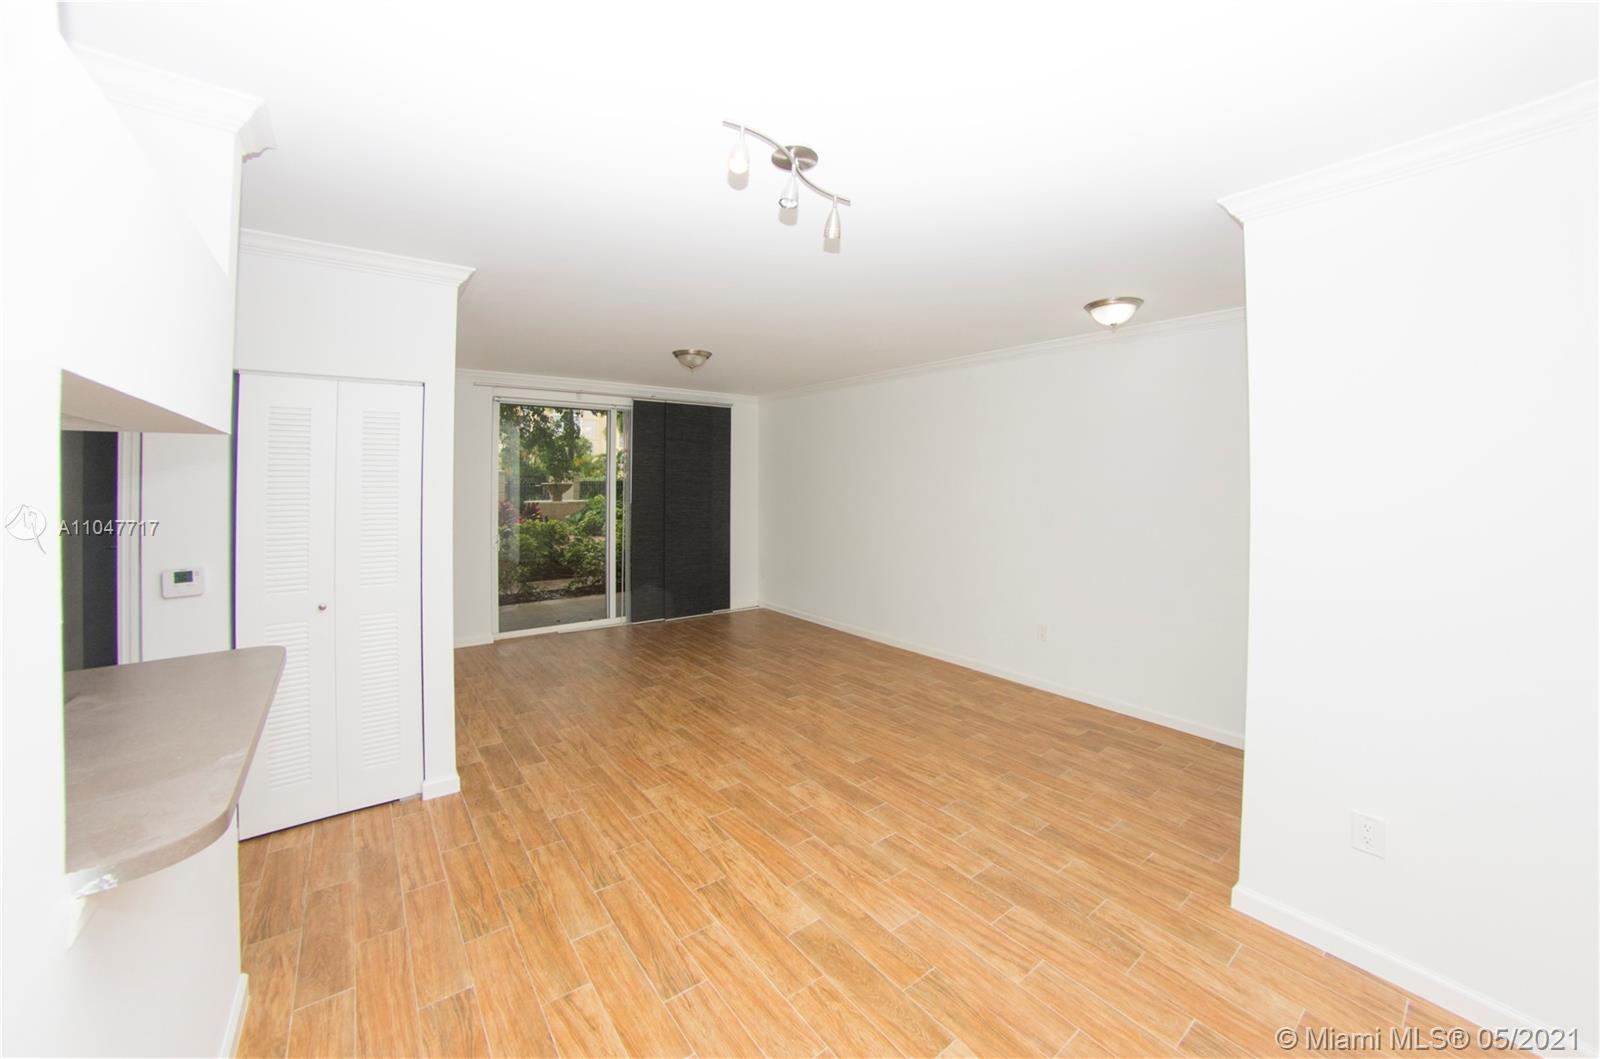 17125 N Bay Rd #3102 For Sale A11047717, FL